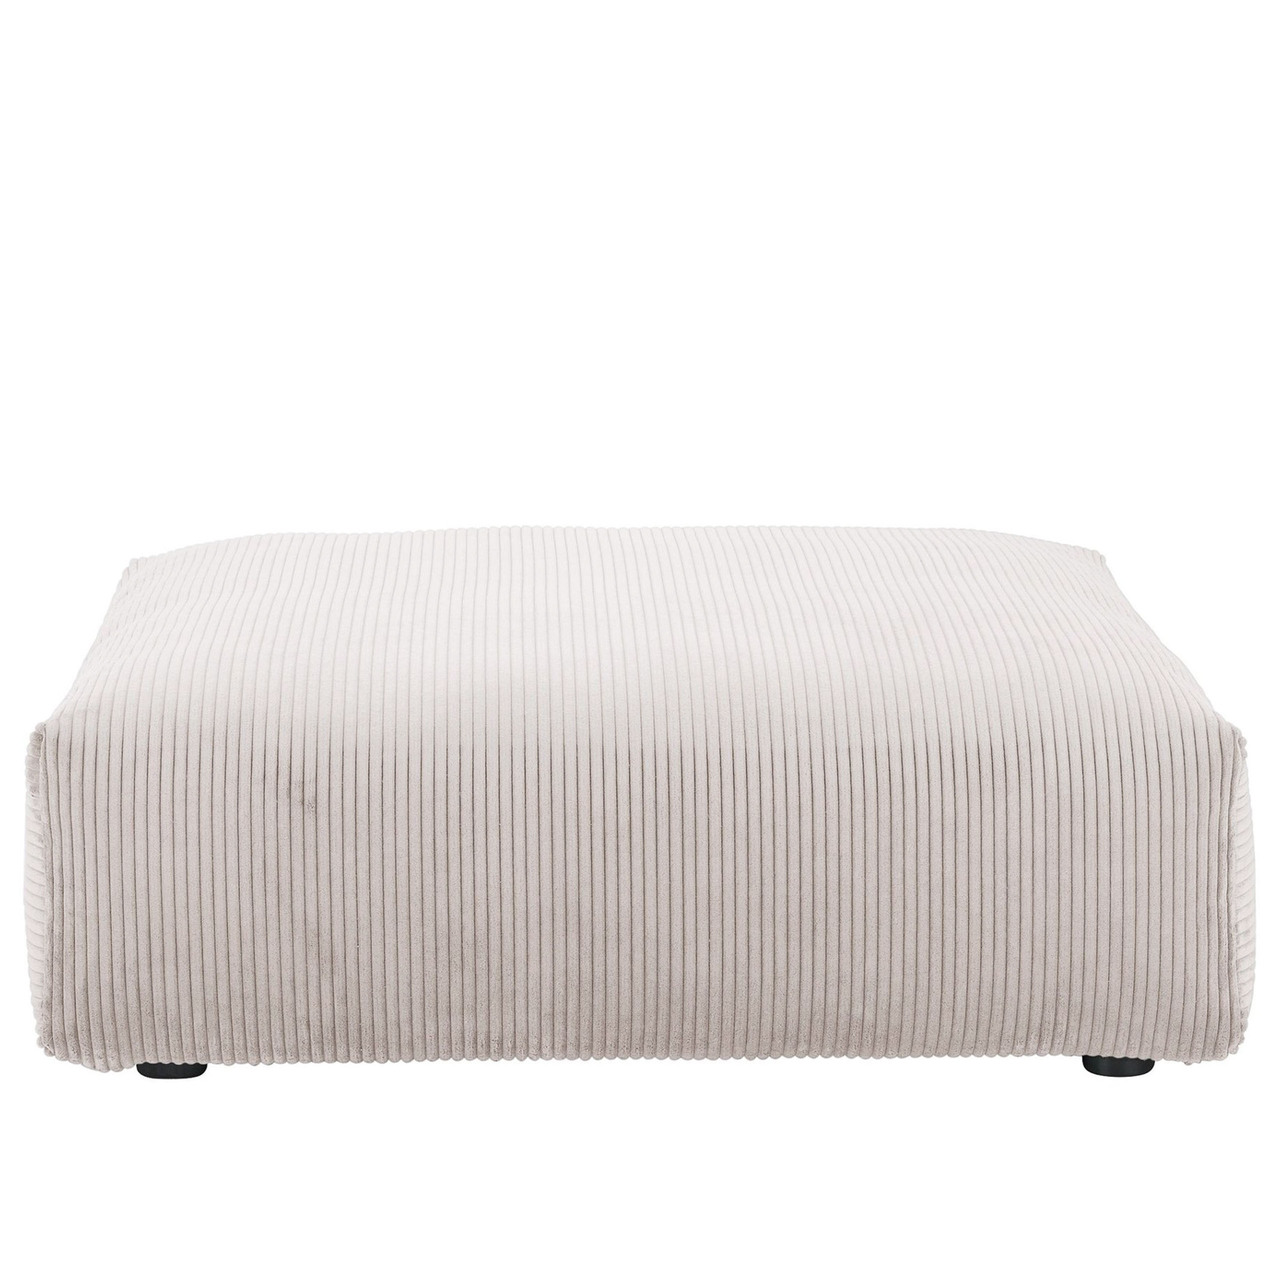 Vetsak Sofa Seat Large Cord Velour - Platin